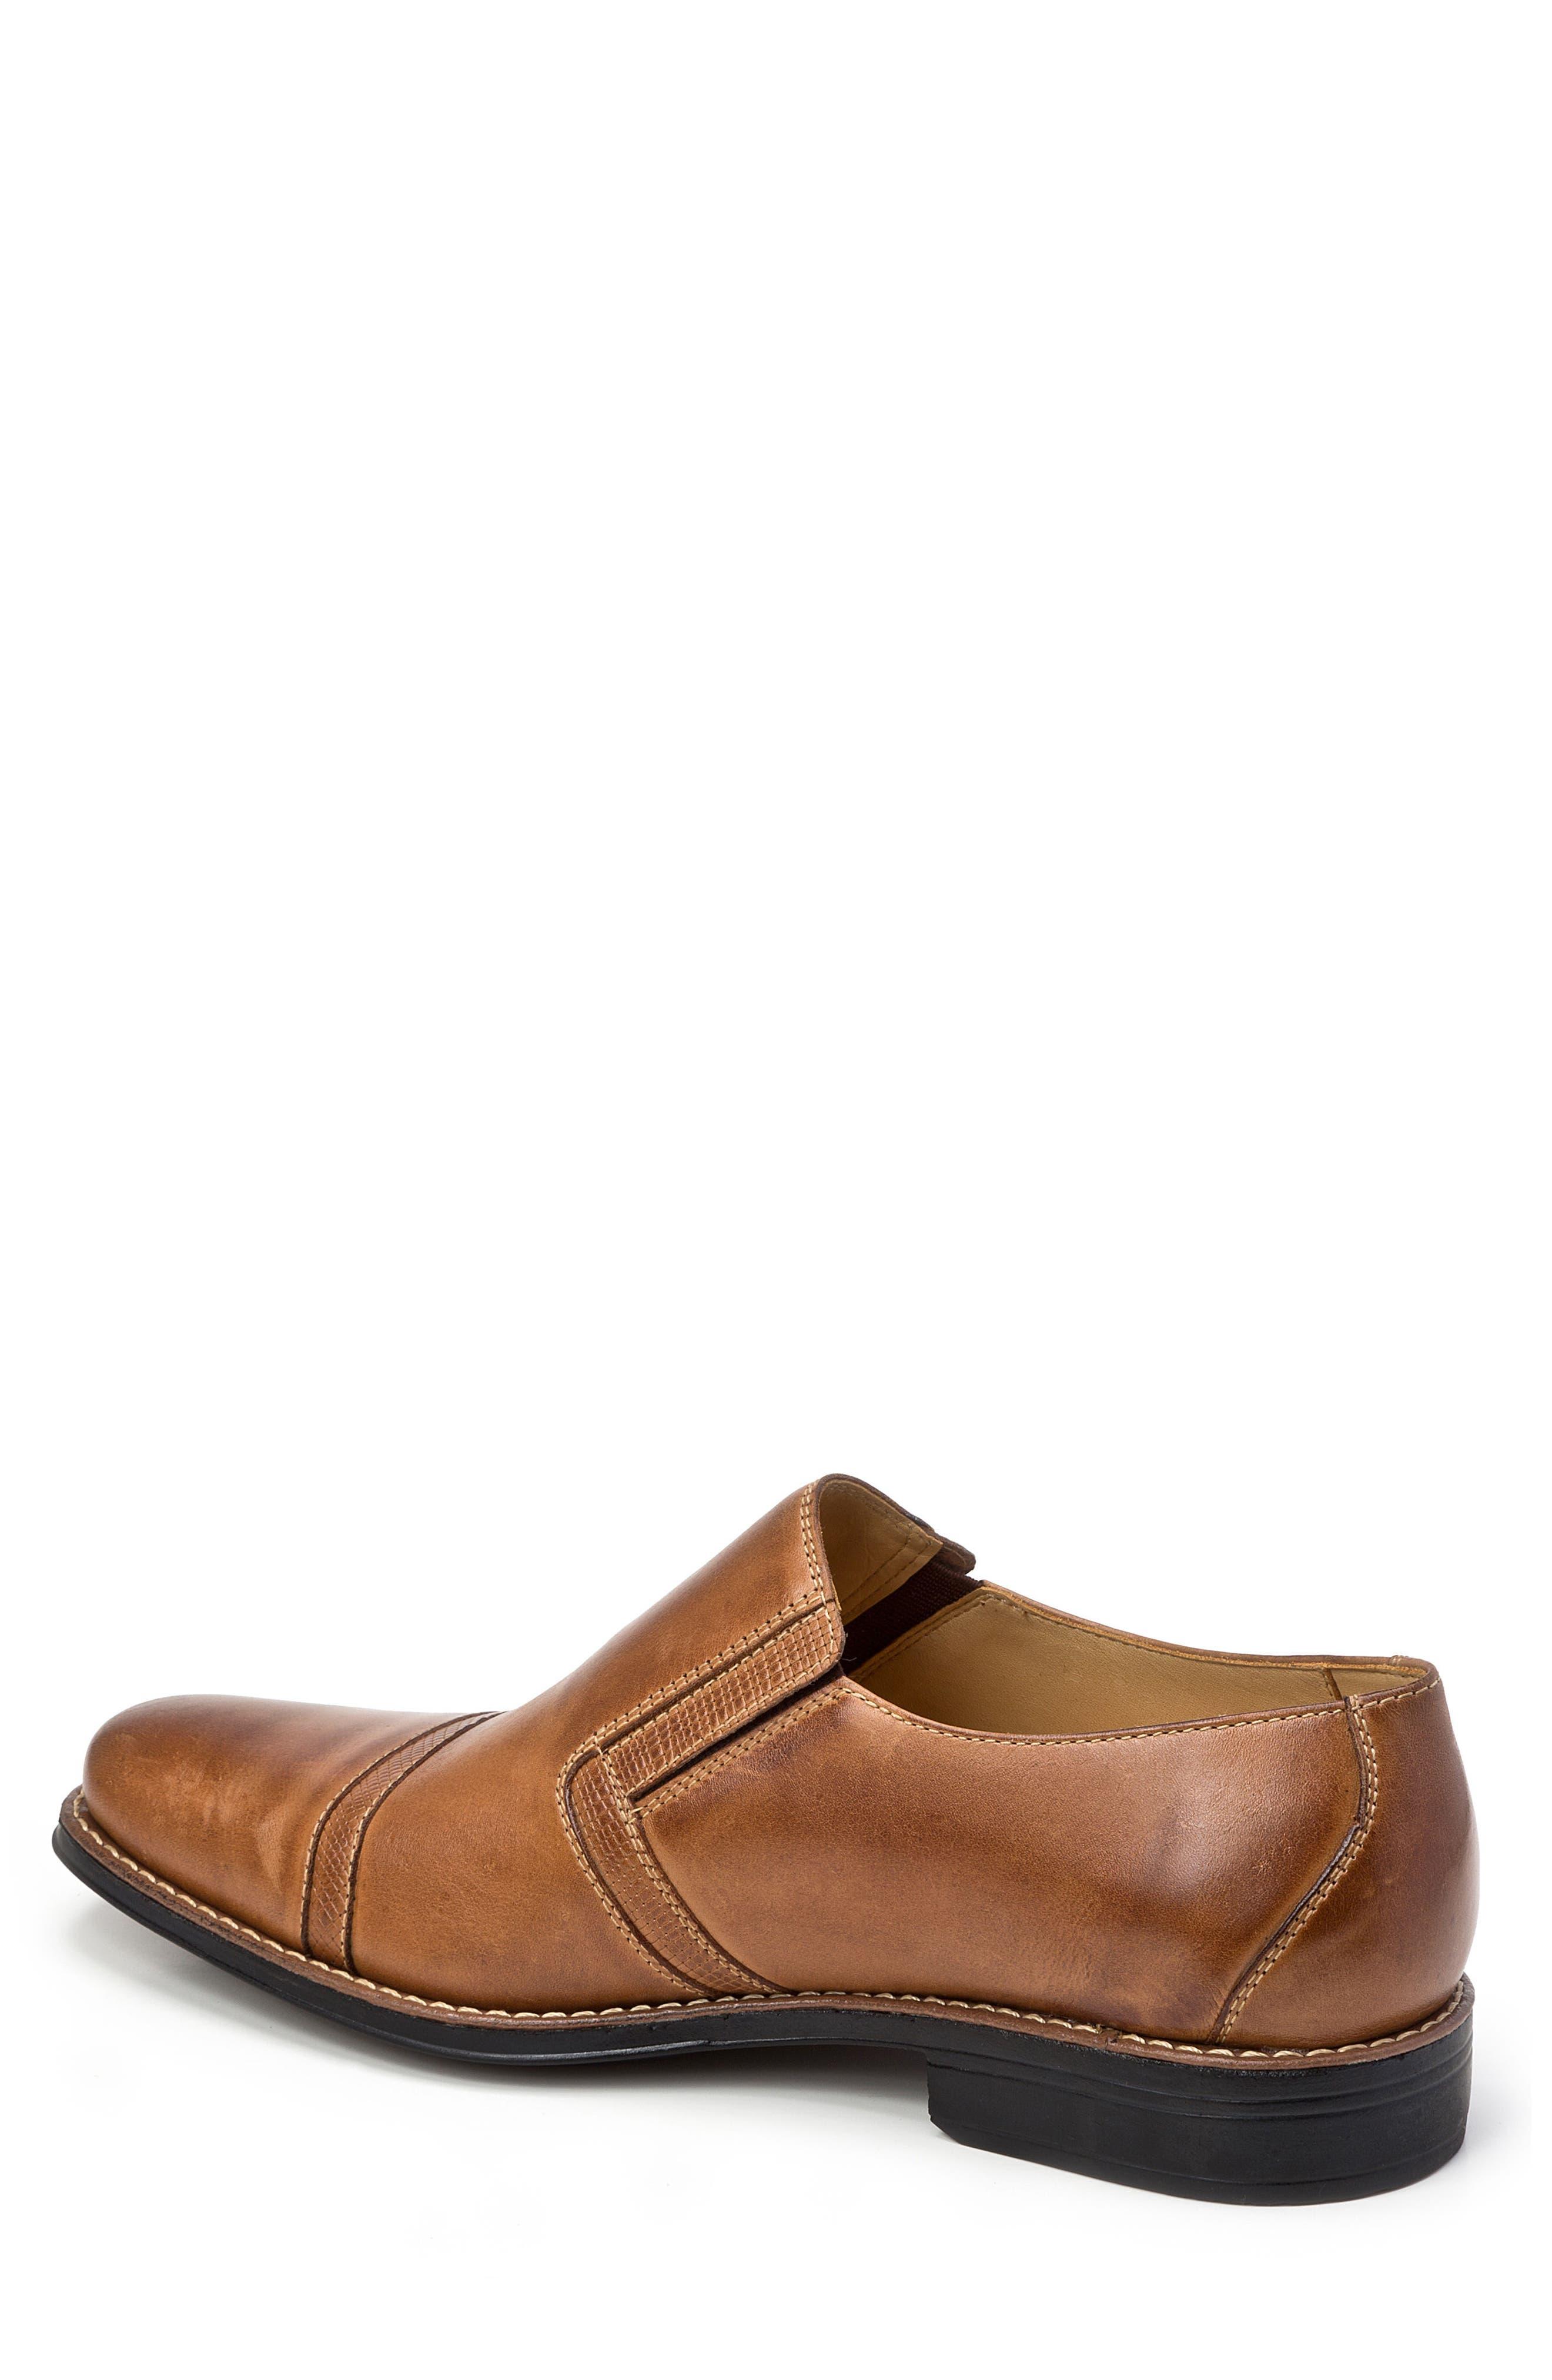 Sebastian Venetian Loafer,                             Alternate thumbnail 2, color,                             Tan Leather